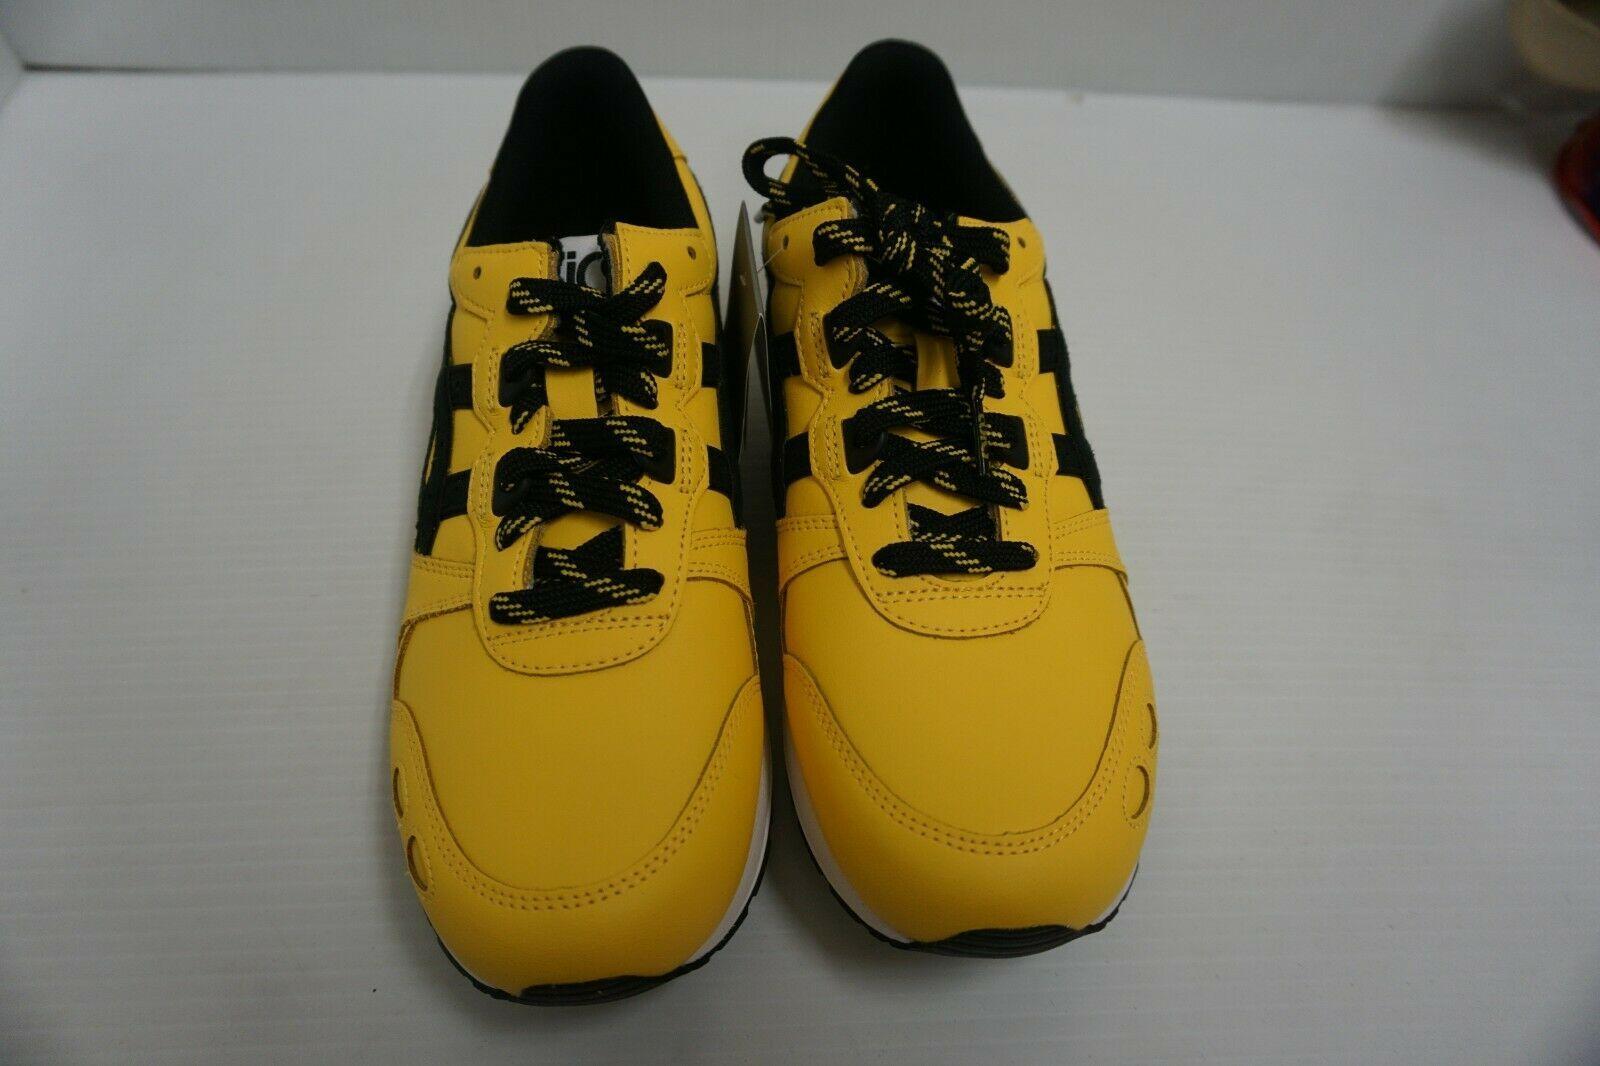 71e255f6ff Asics Hommes Gel Lyte Tai Chi Noir Jaune Chaussures Course Size 7.5 Us